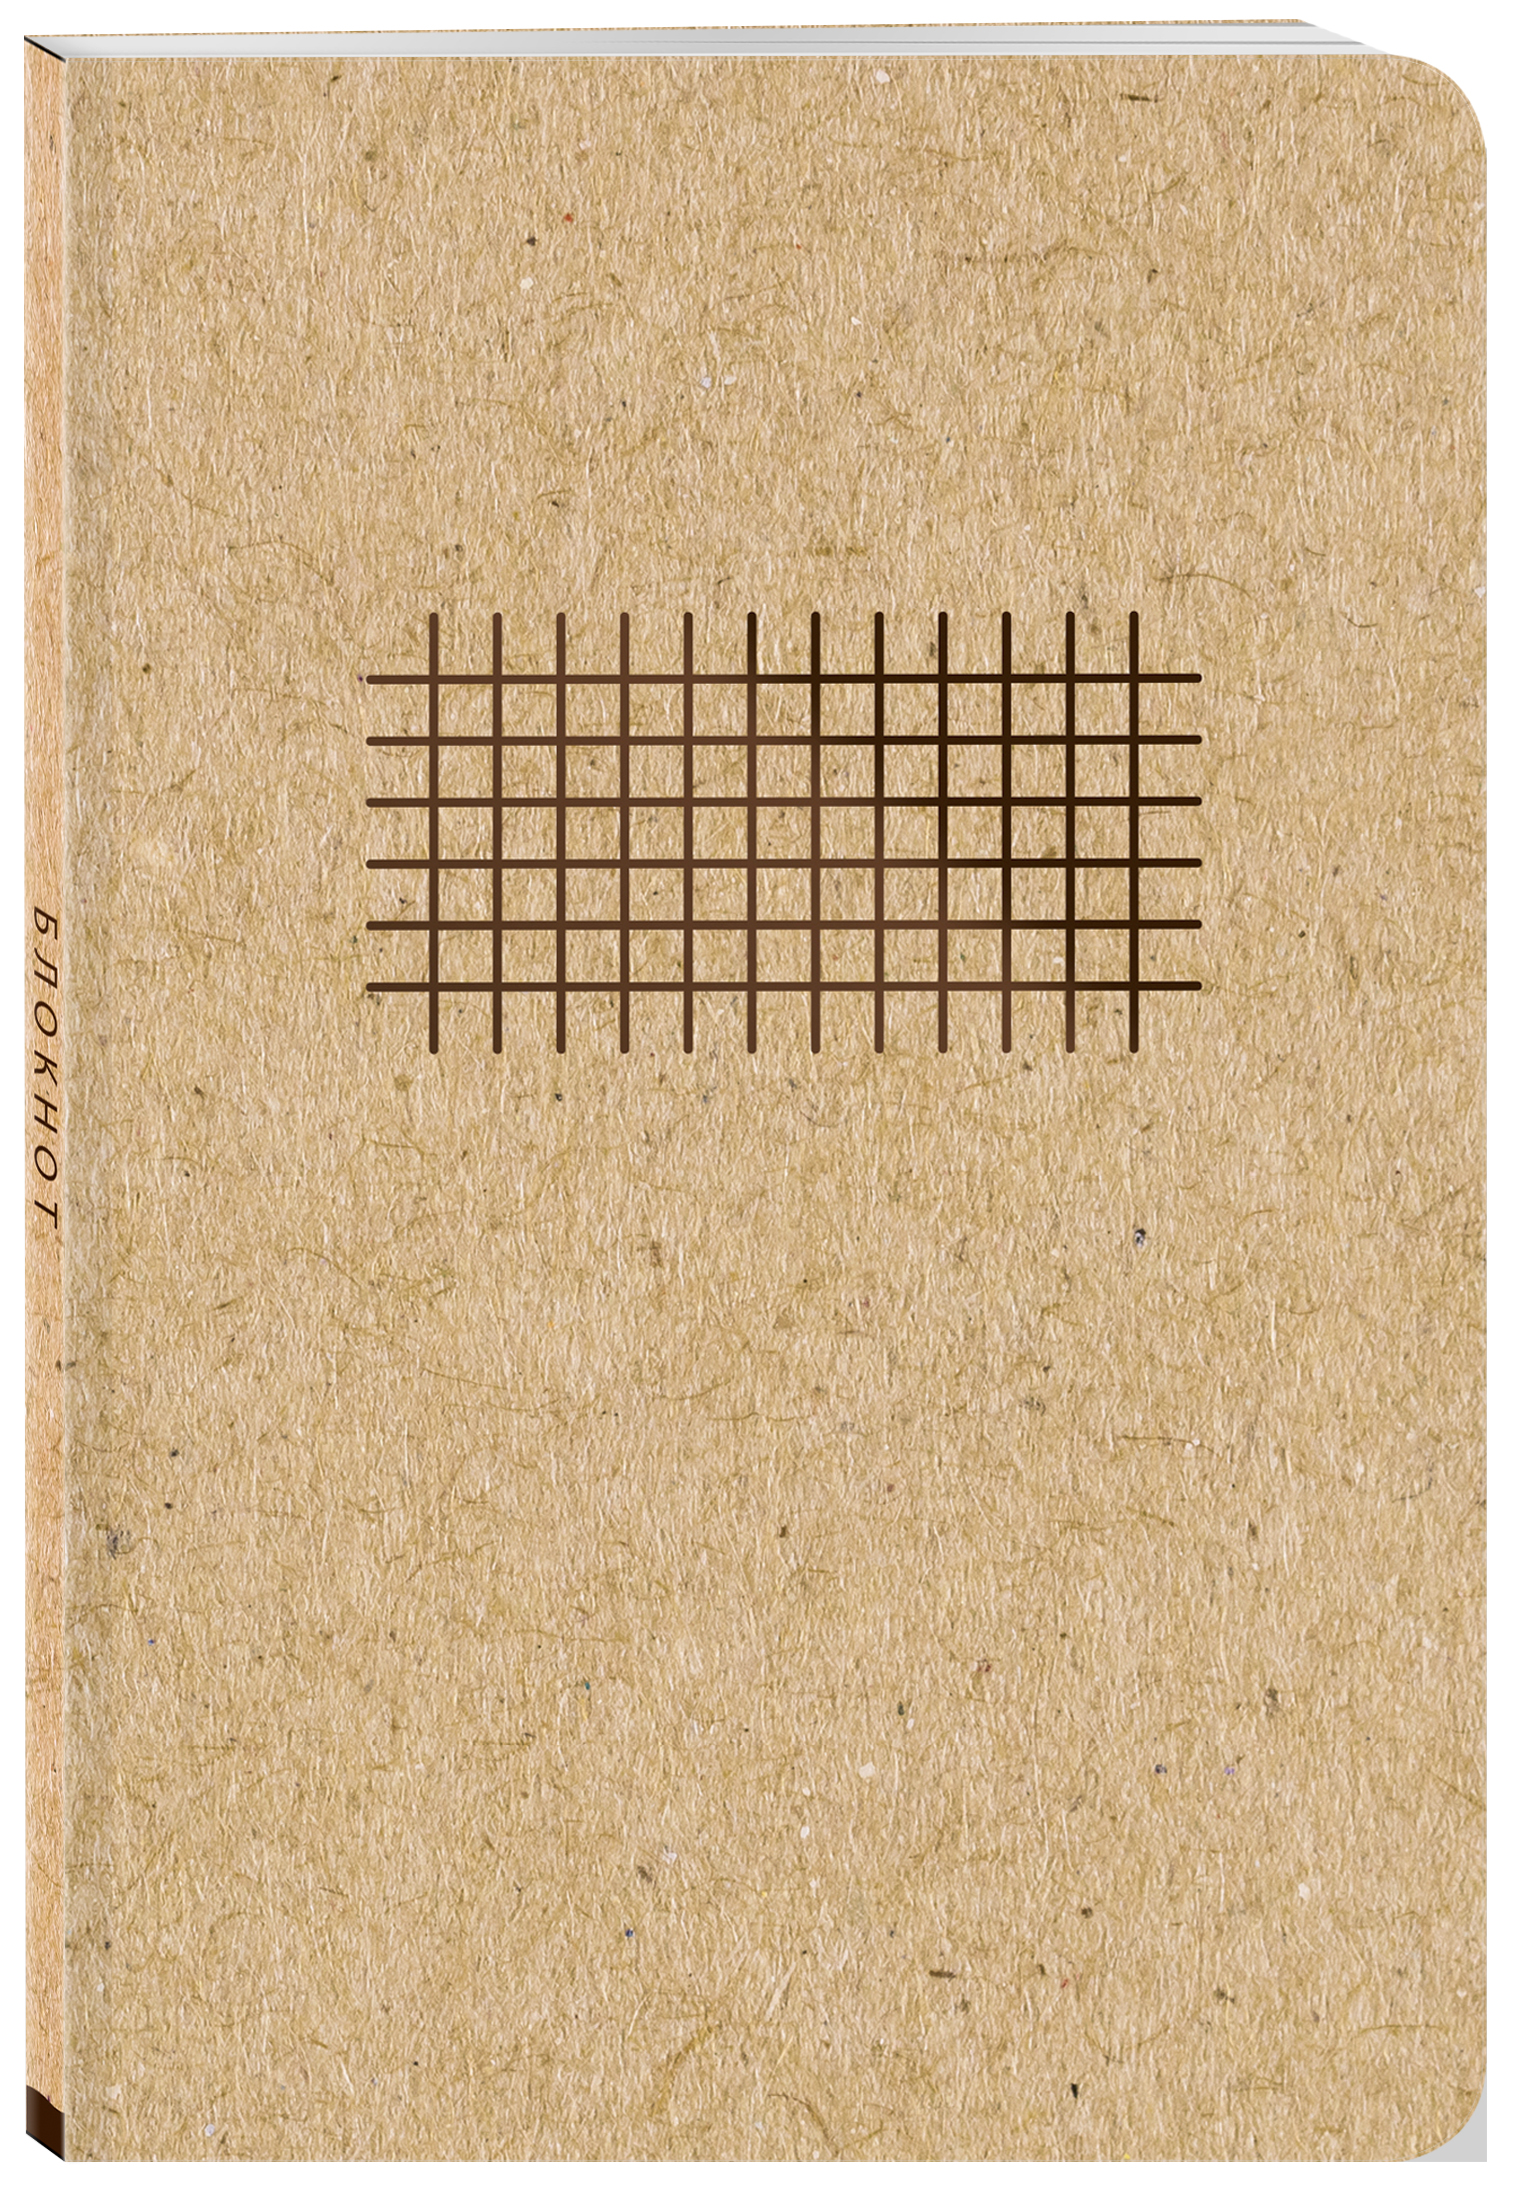 Блокнот. Что внутри? - клетка ( обложка крафт, круглые углы, в клетку) (Арте) крафт блокнот сова